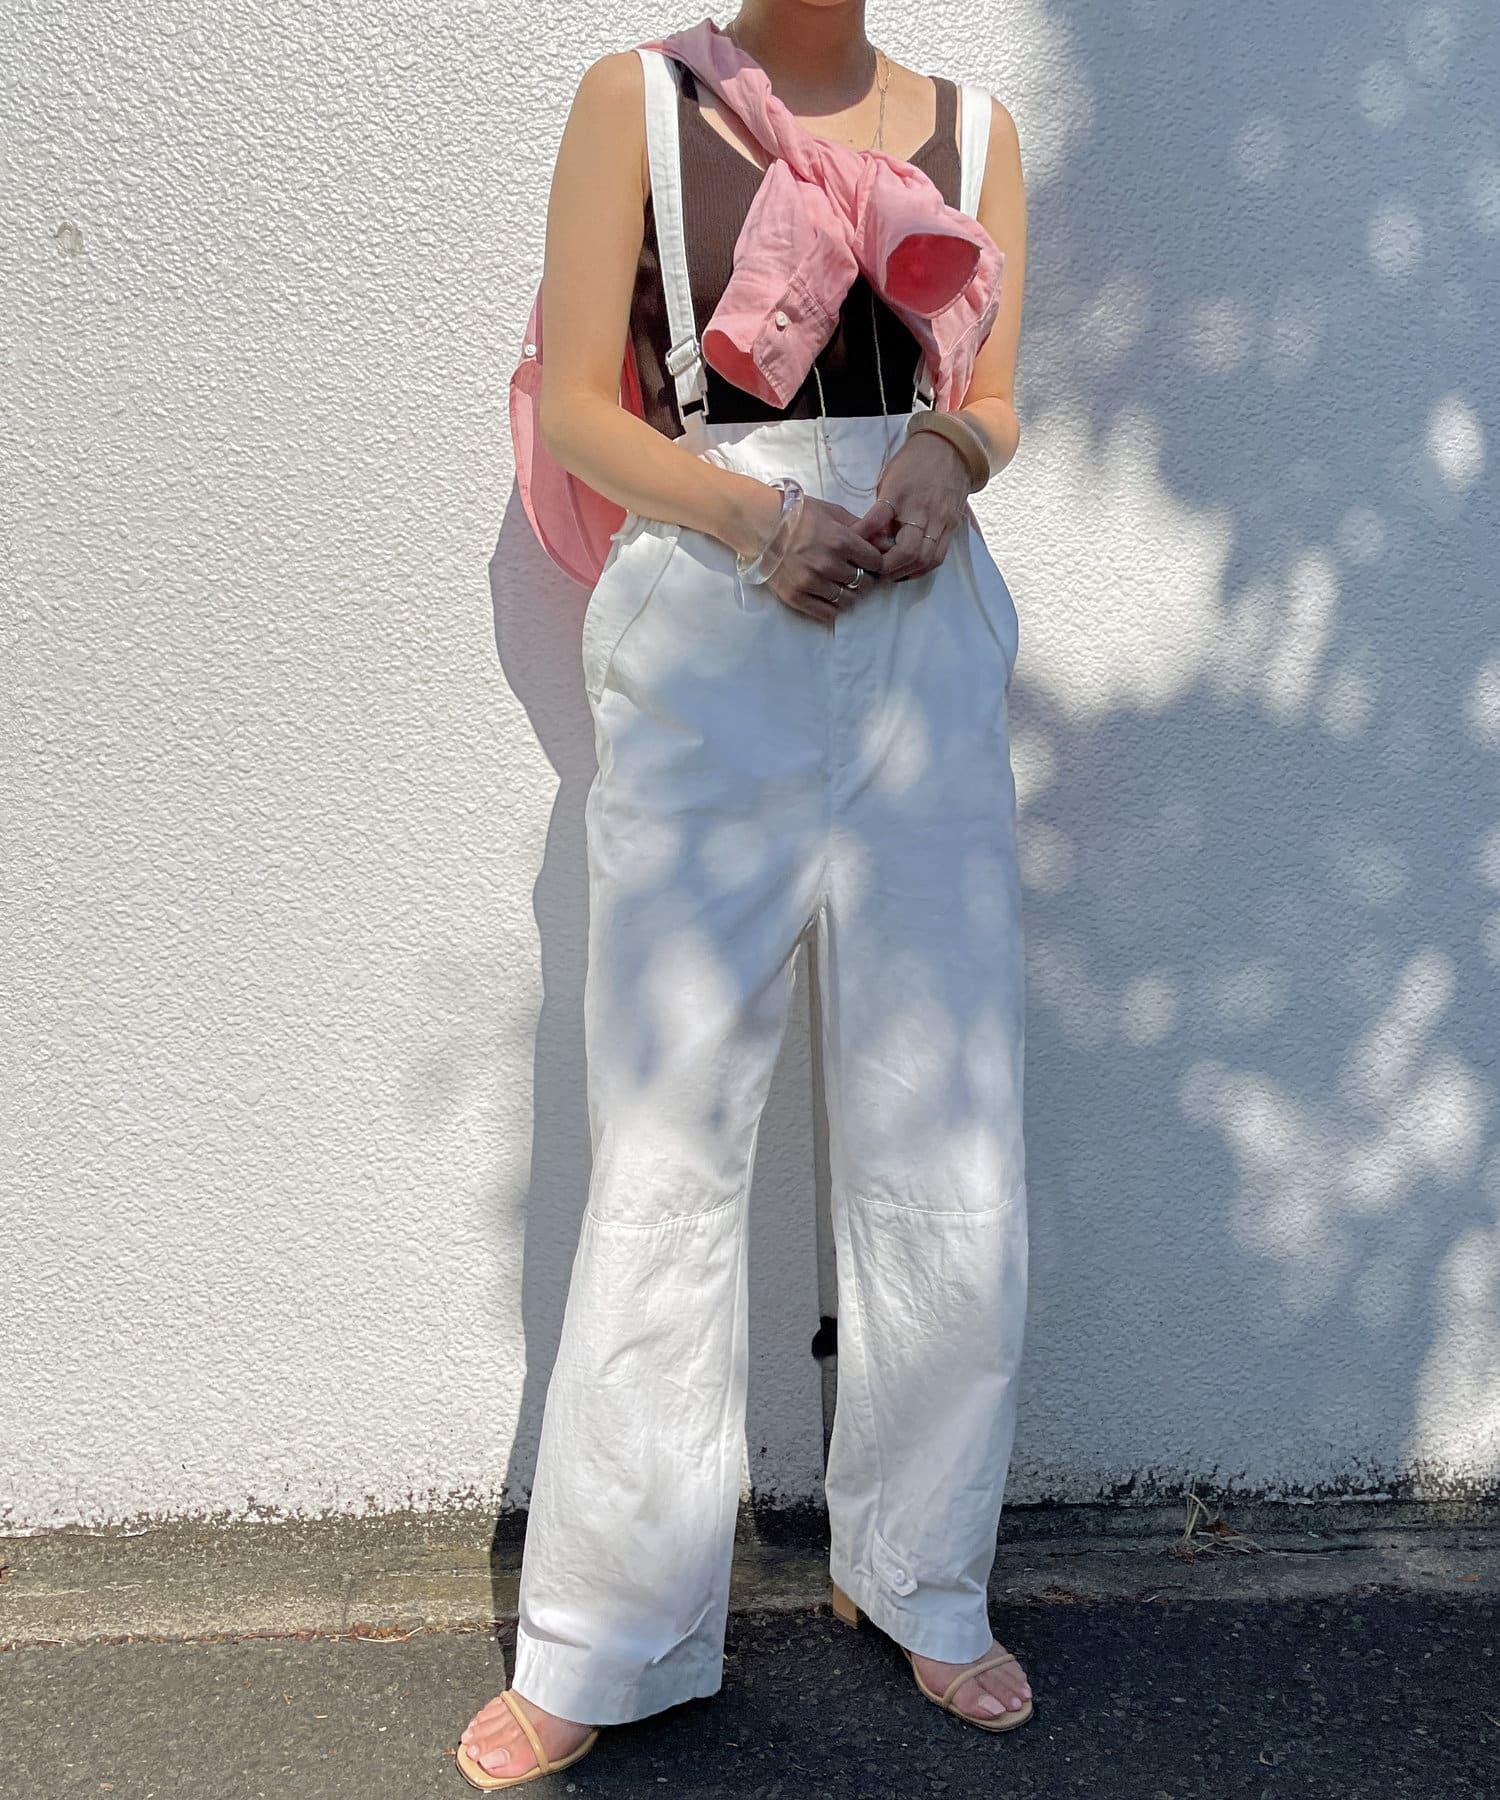 Omekashi(オメカシ) サスペンダー付き裾絞りパンツ